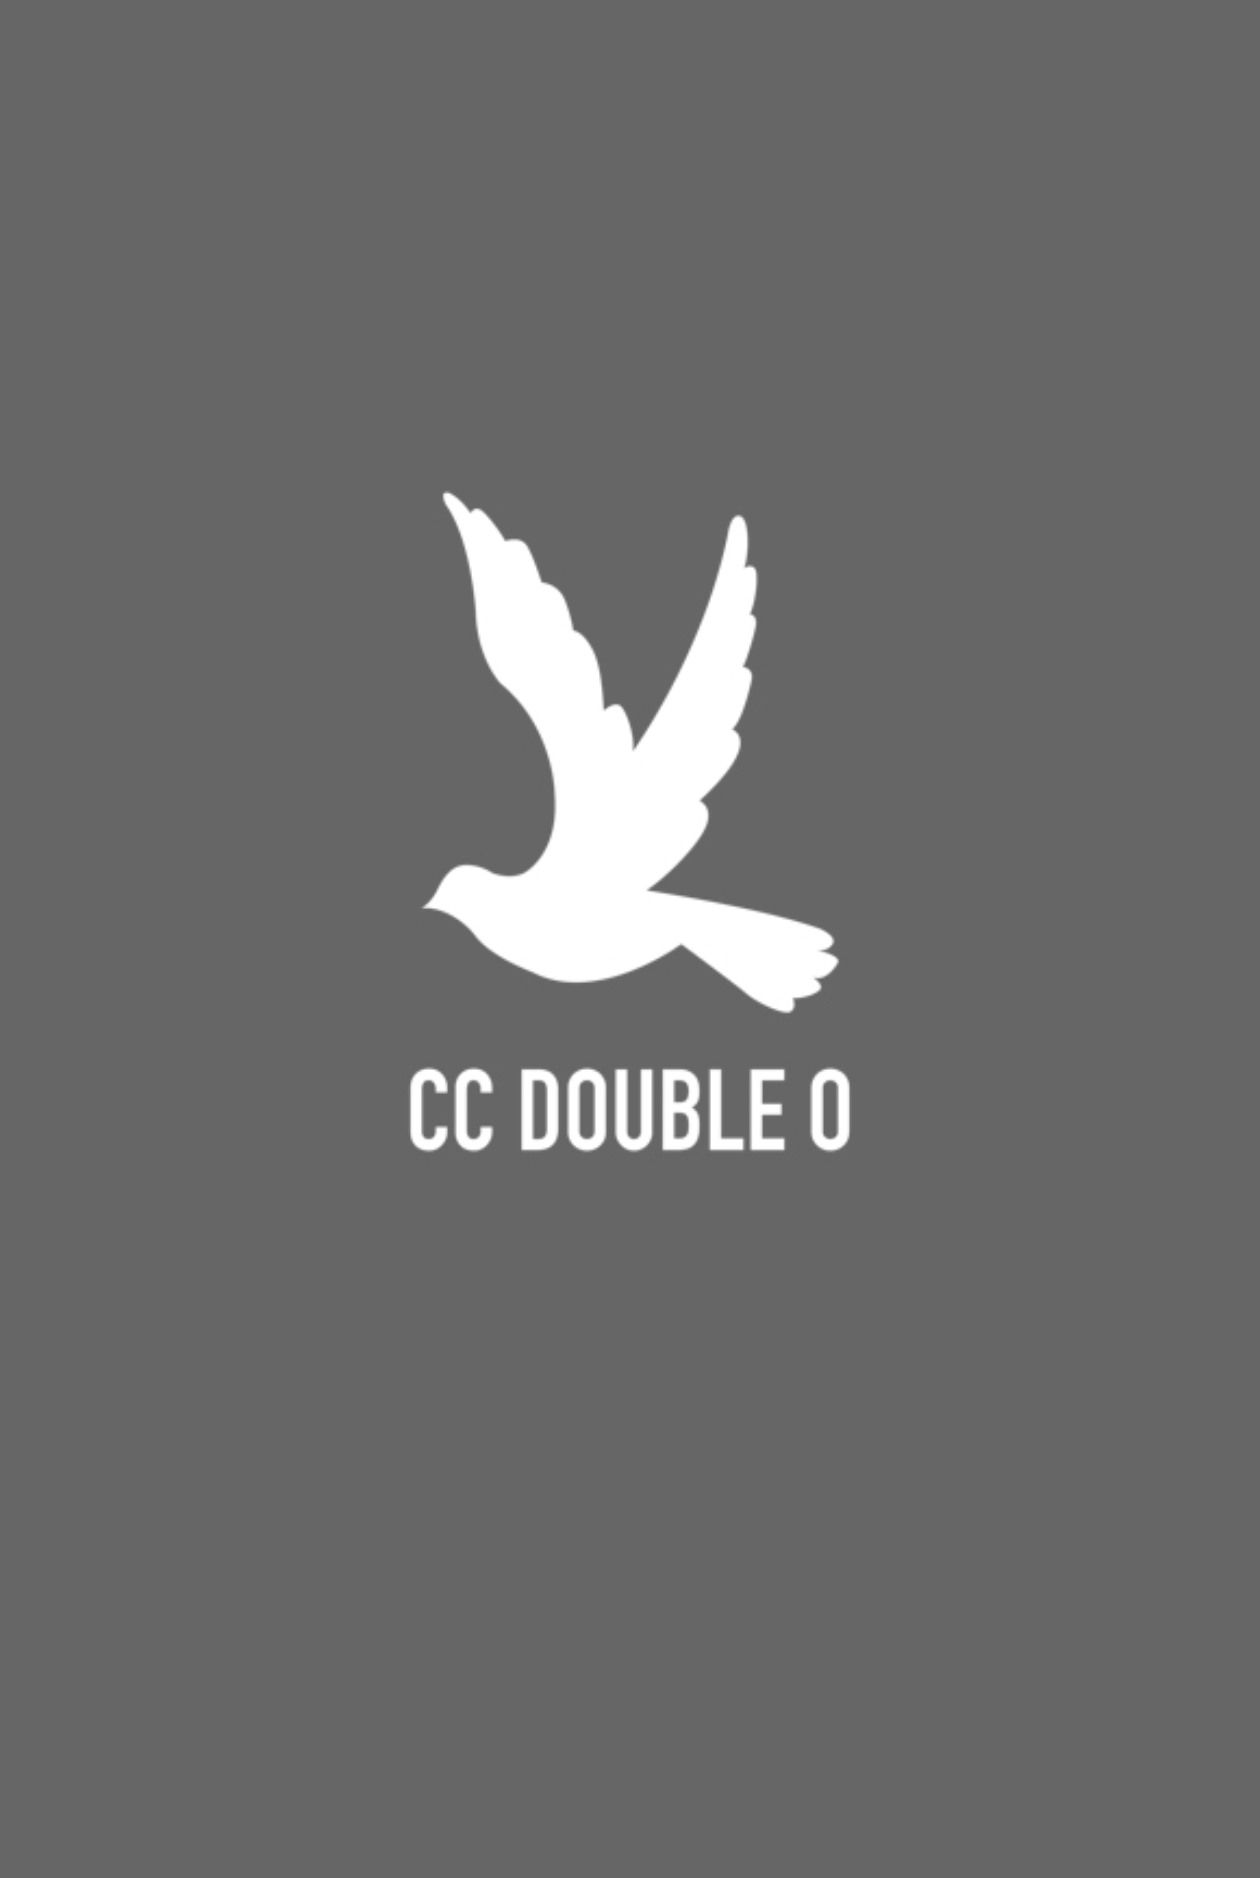 CC DOUBLE O Long-Sleeved Tee